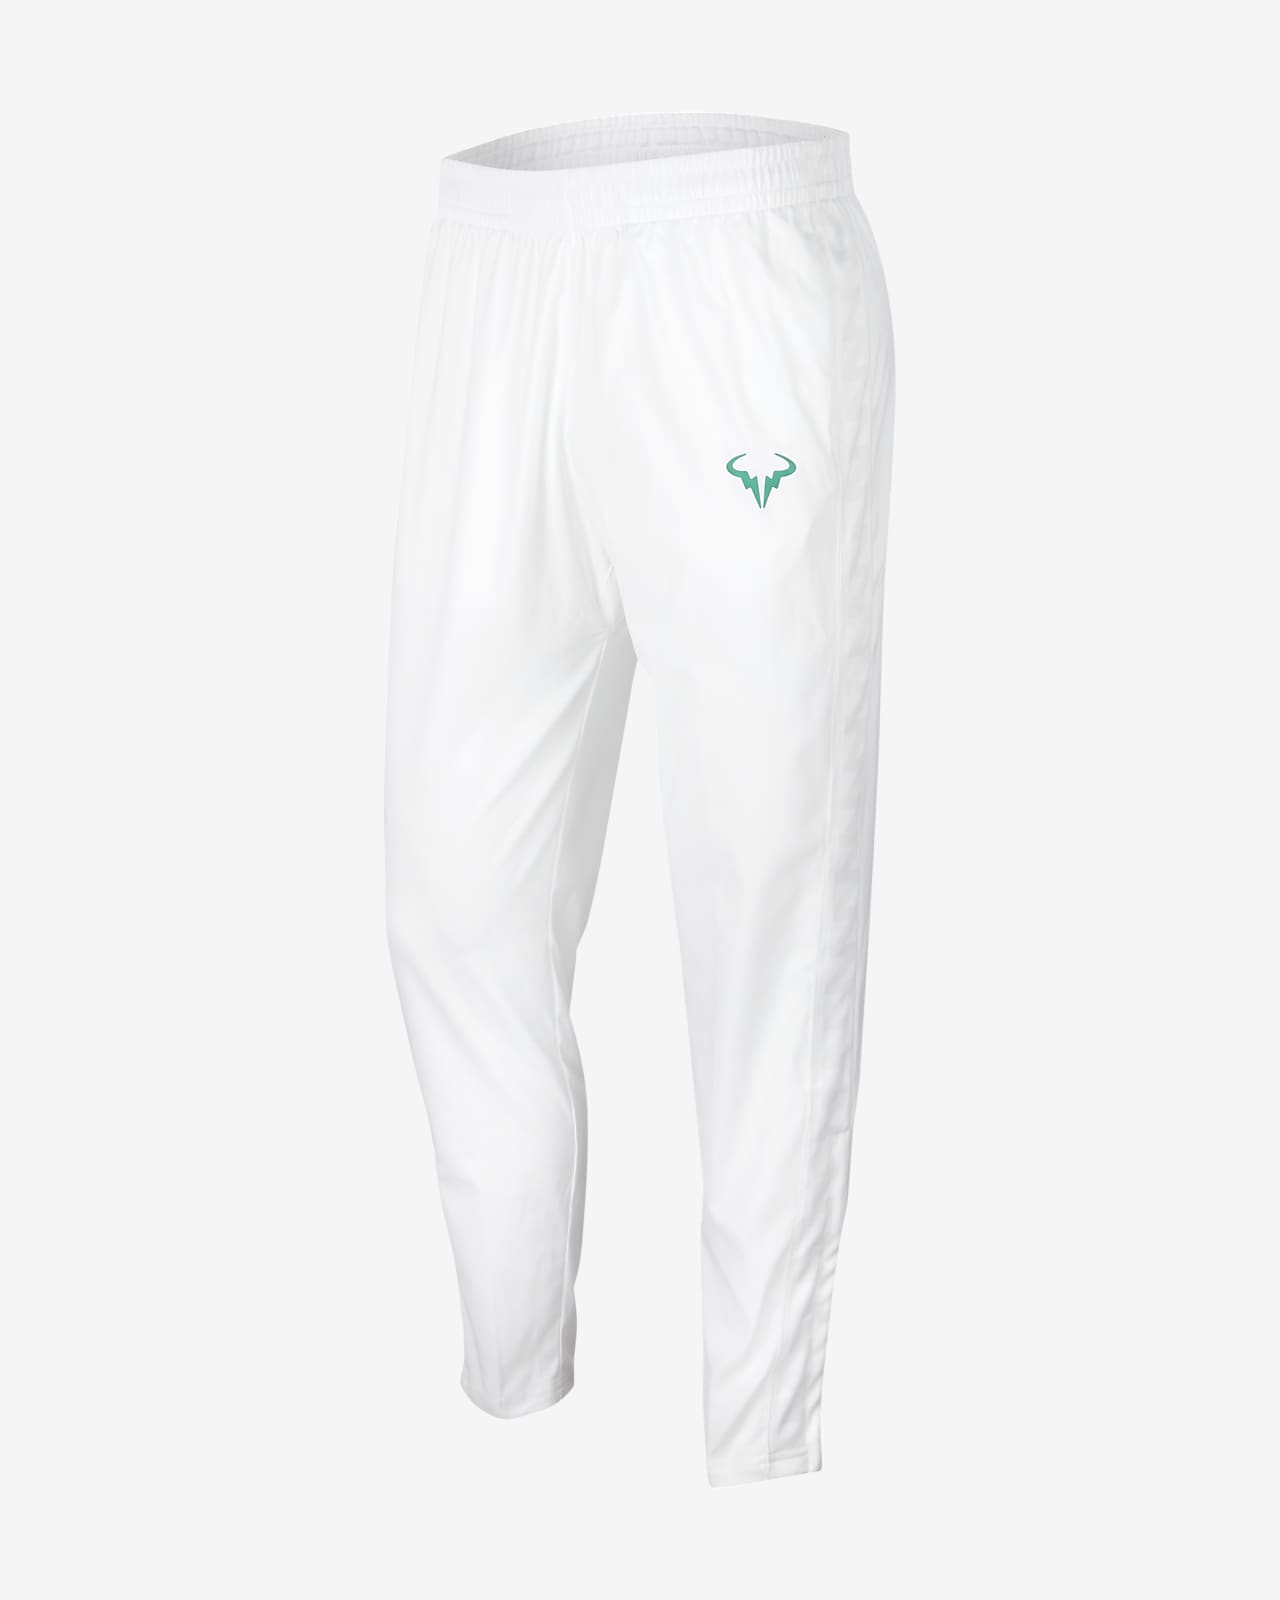 Rafa Men's Tennis Trousers